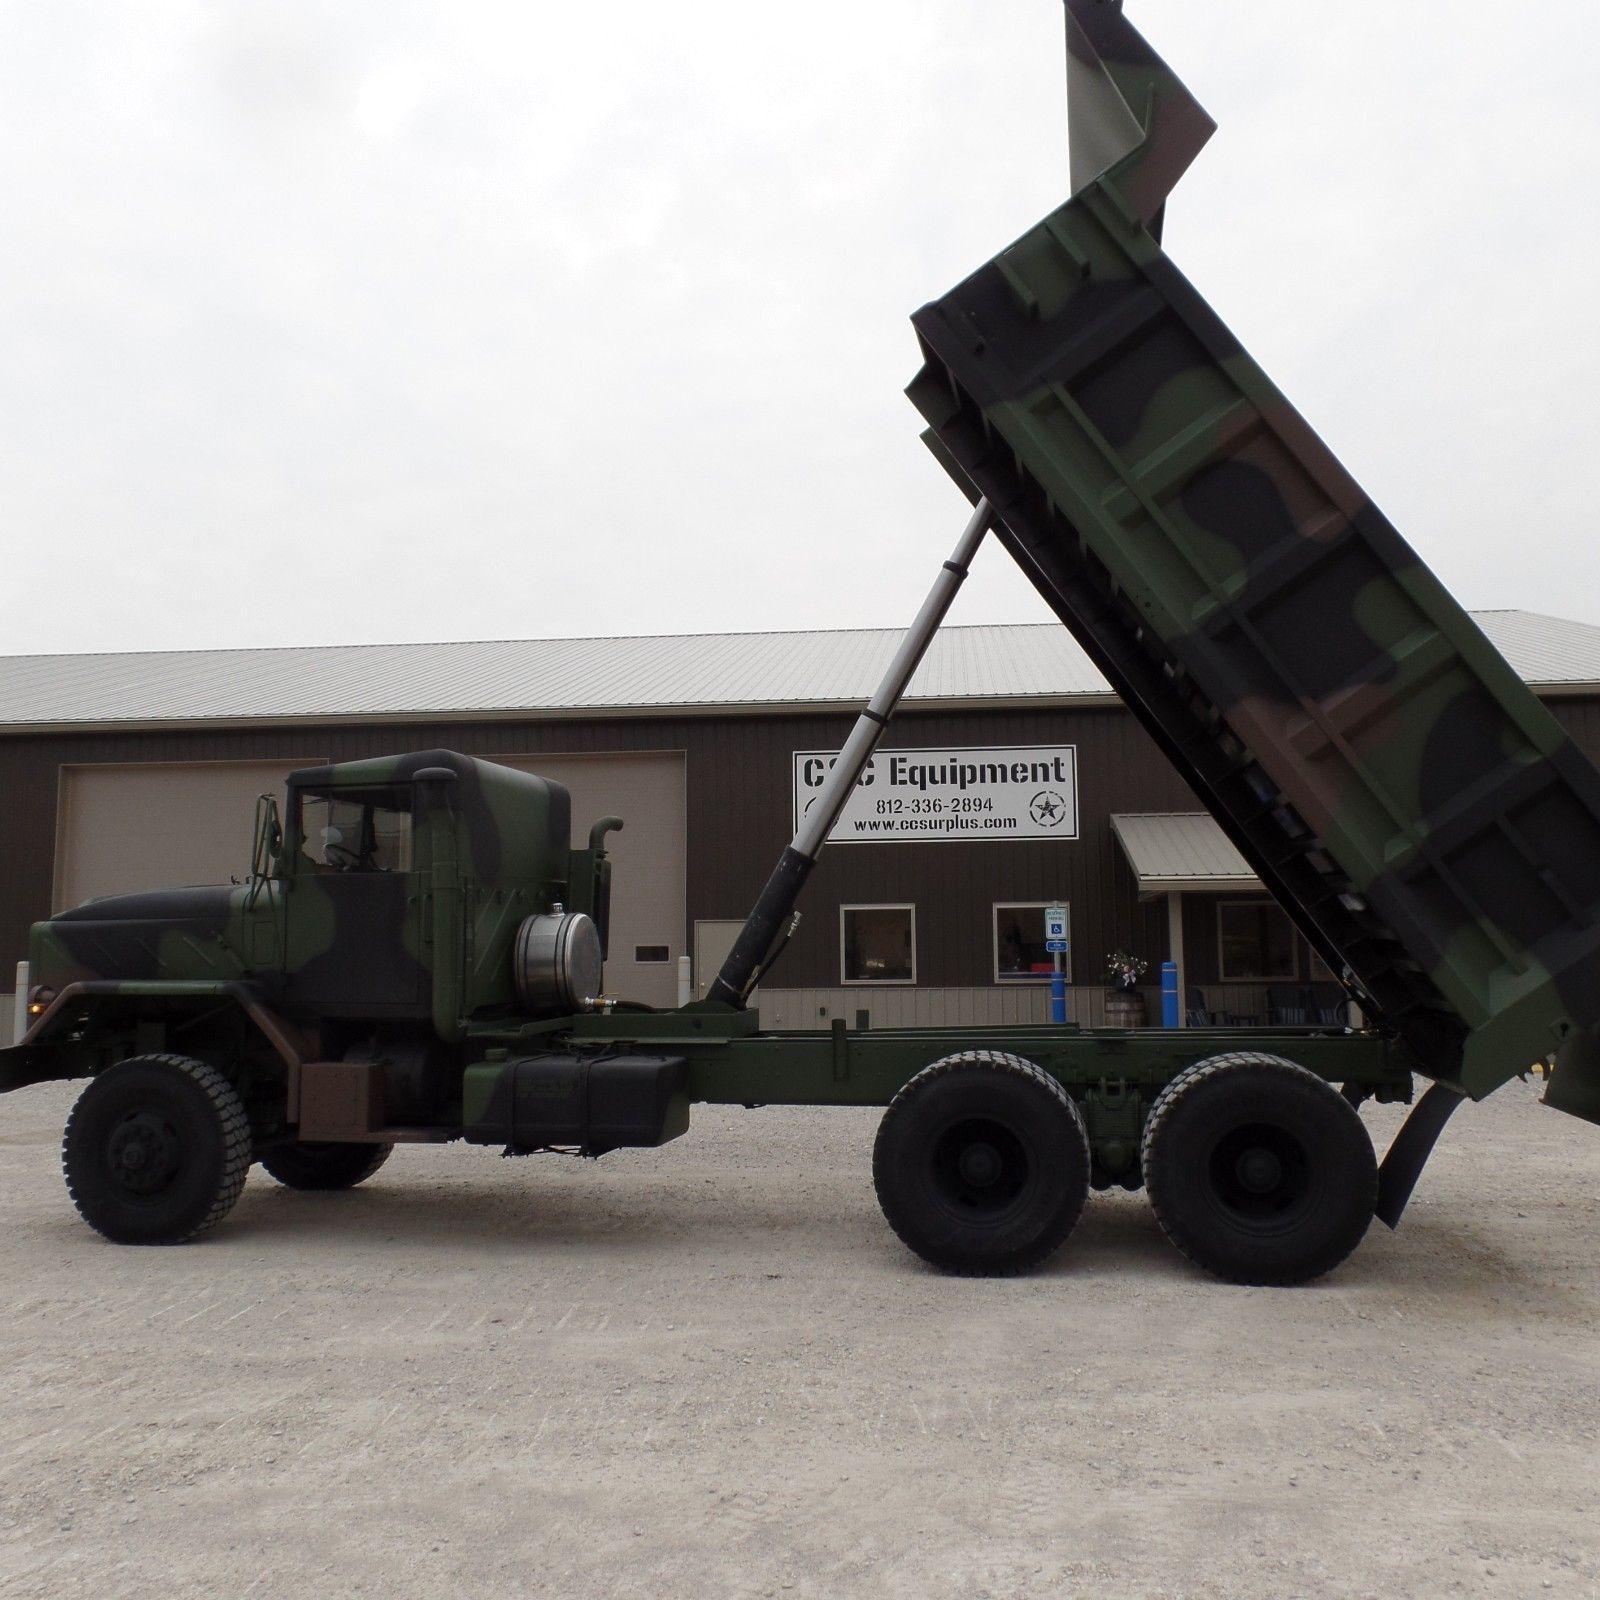 dump truck 1984 AM General M934a1 military